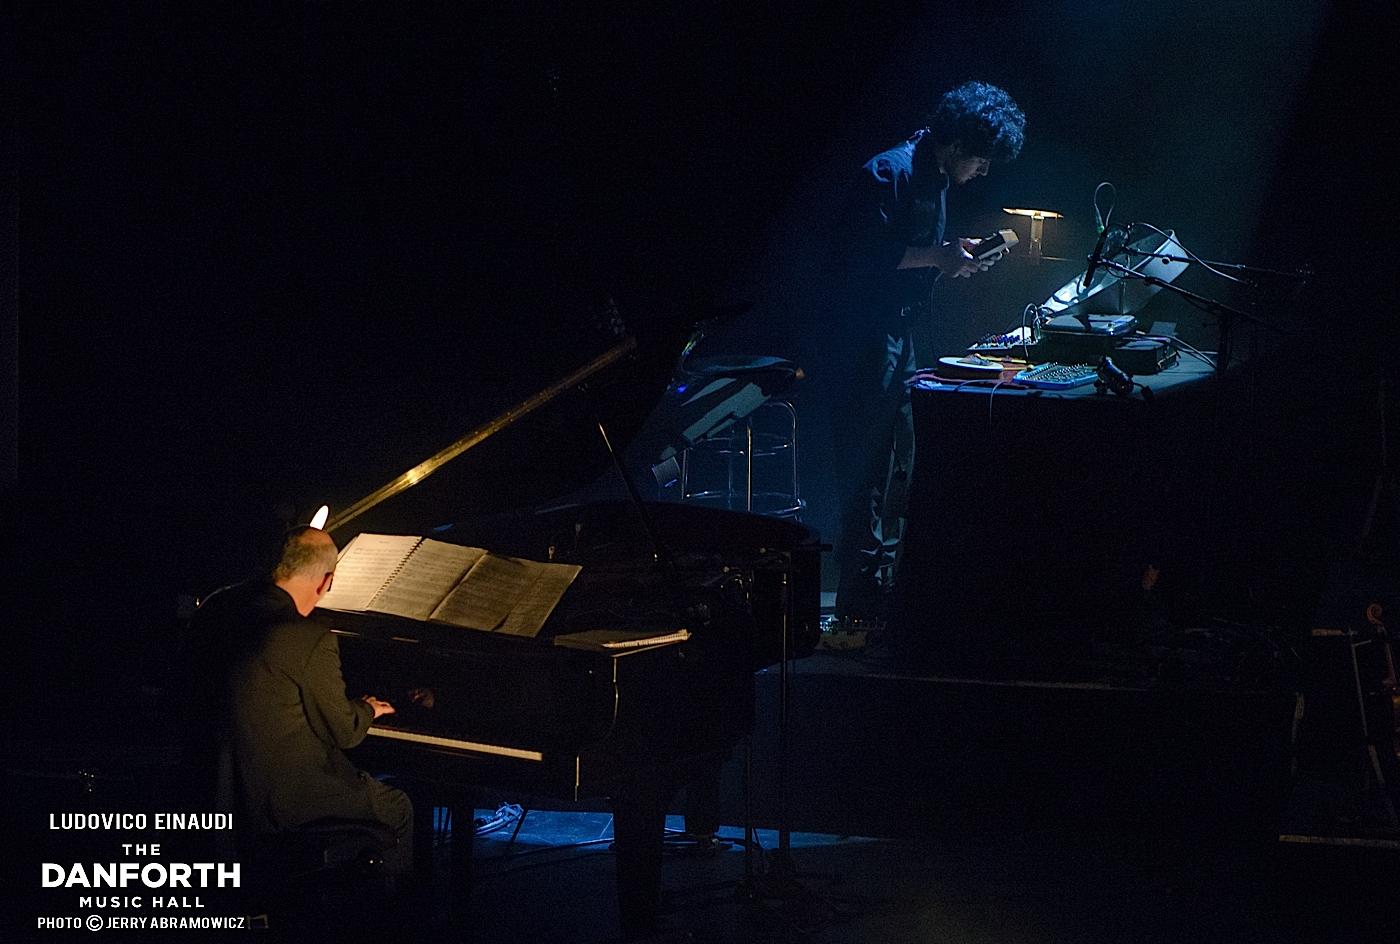 20130517 Ludovico Einaudi performs at The Danforth Music Hall Toronto 0154